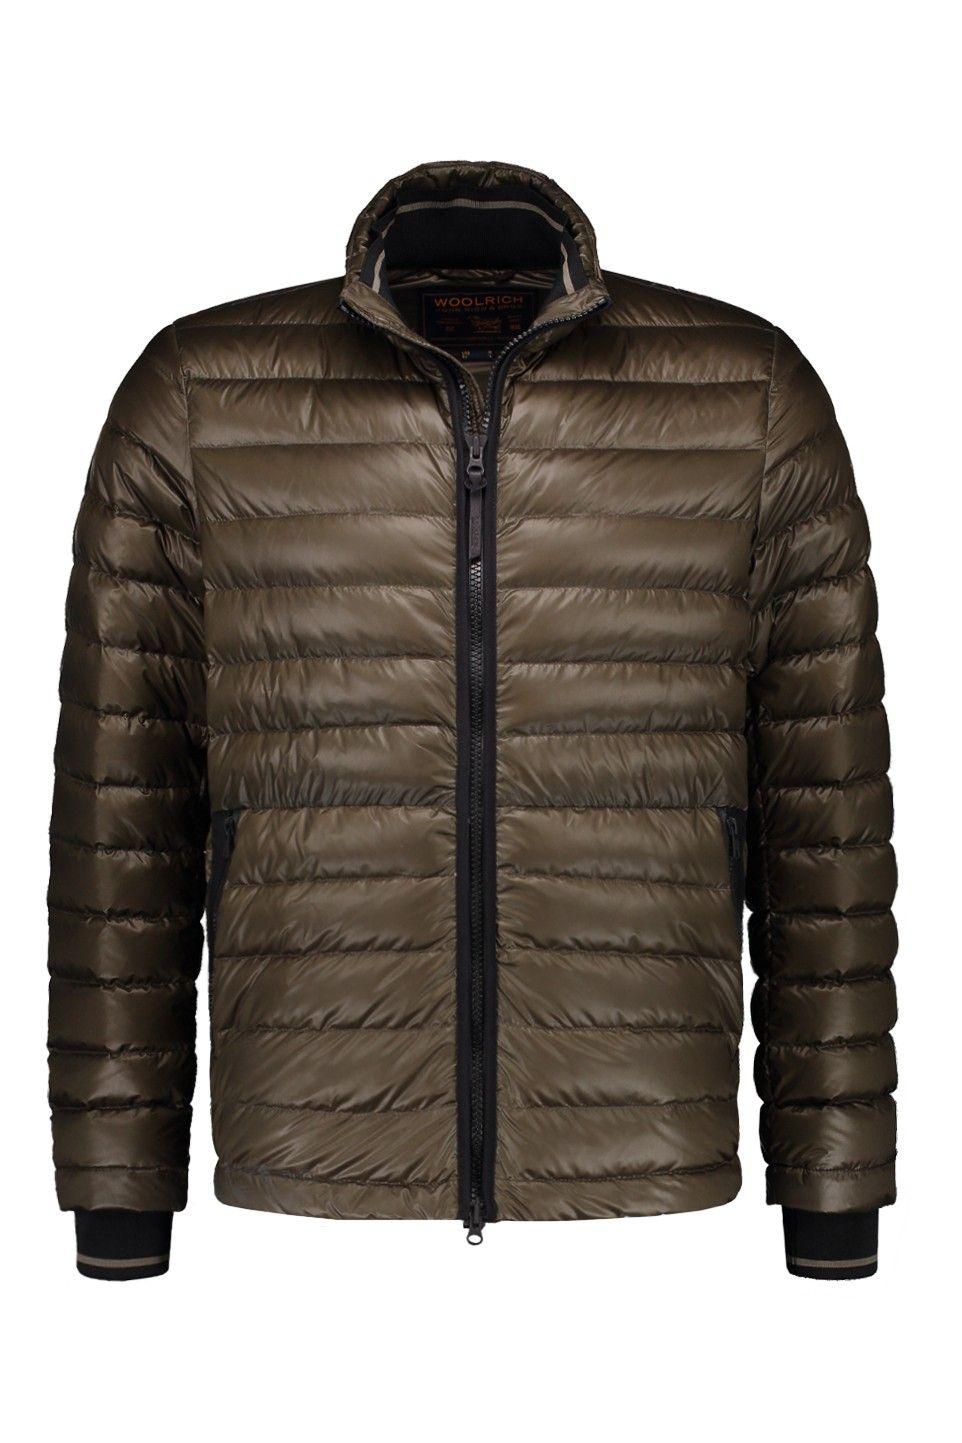 Winterjas Merken 2019.Woolrich Bering Down Jacket Marine Green Wocps2796 Ut1308 6101